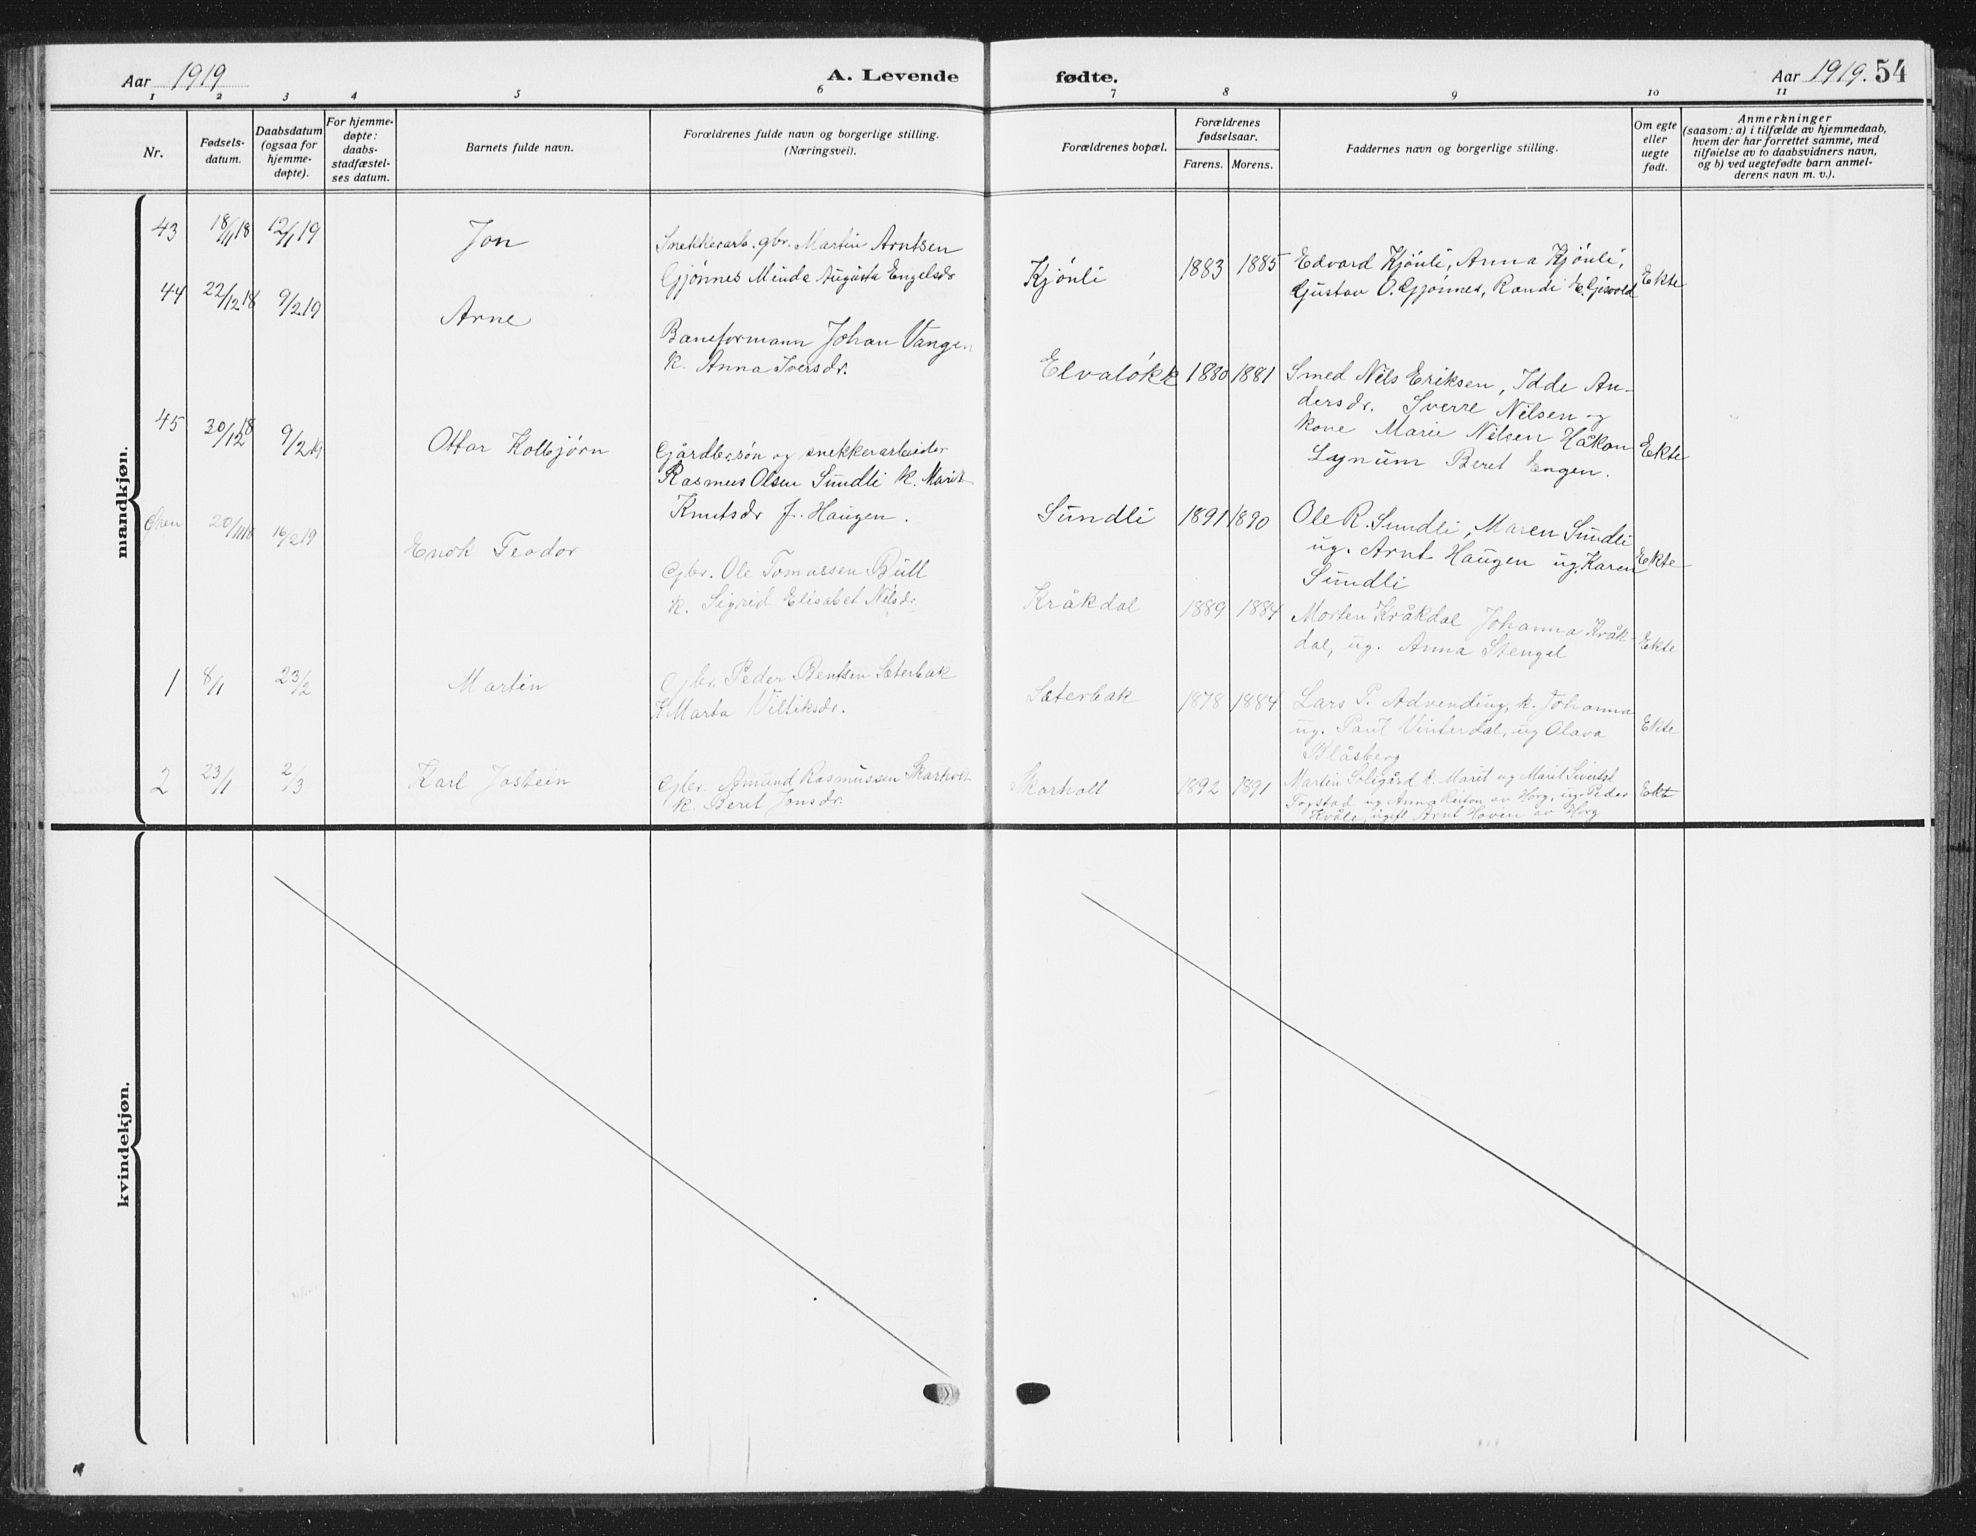 SAT, Ministerialprotokoller, klokkerbøker og fødselsregistre - Sør-Trøndelag, 668/L0820: Parish register (copy) no. 668C09, 1912-1936, p. 54